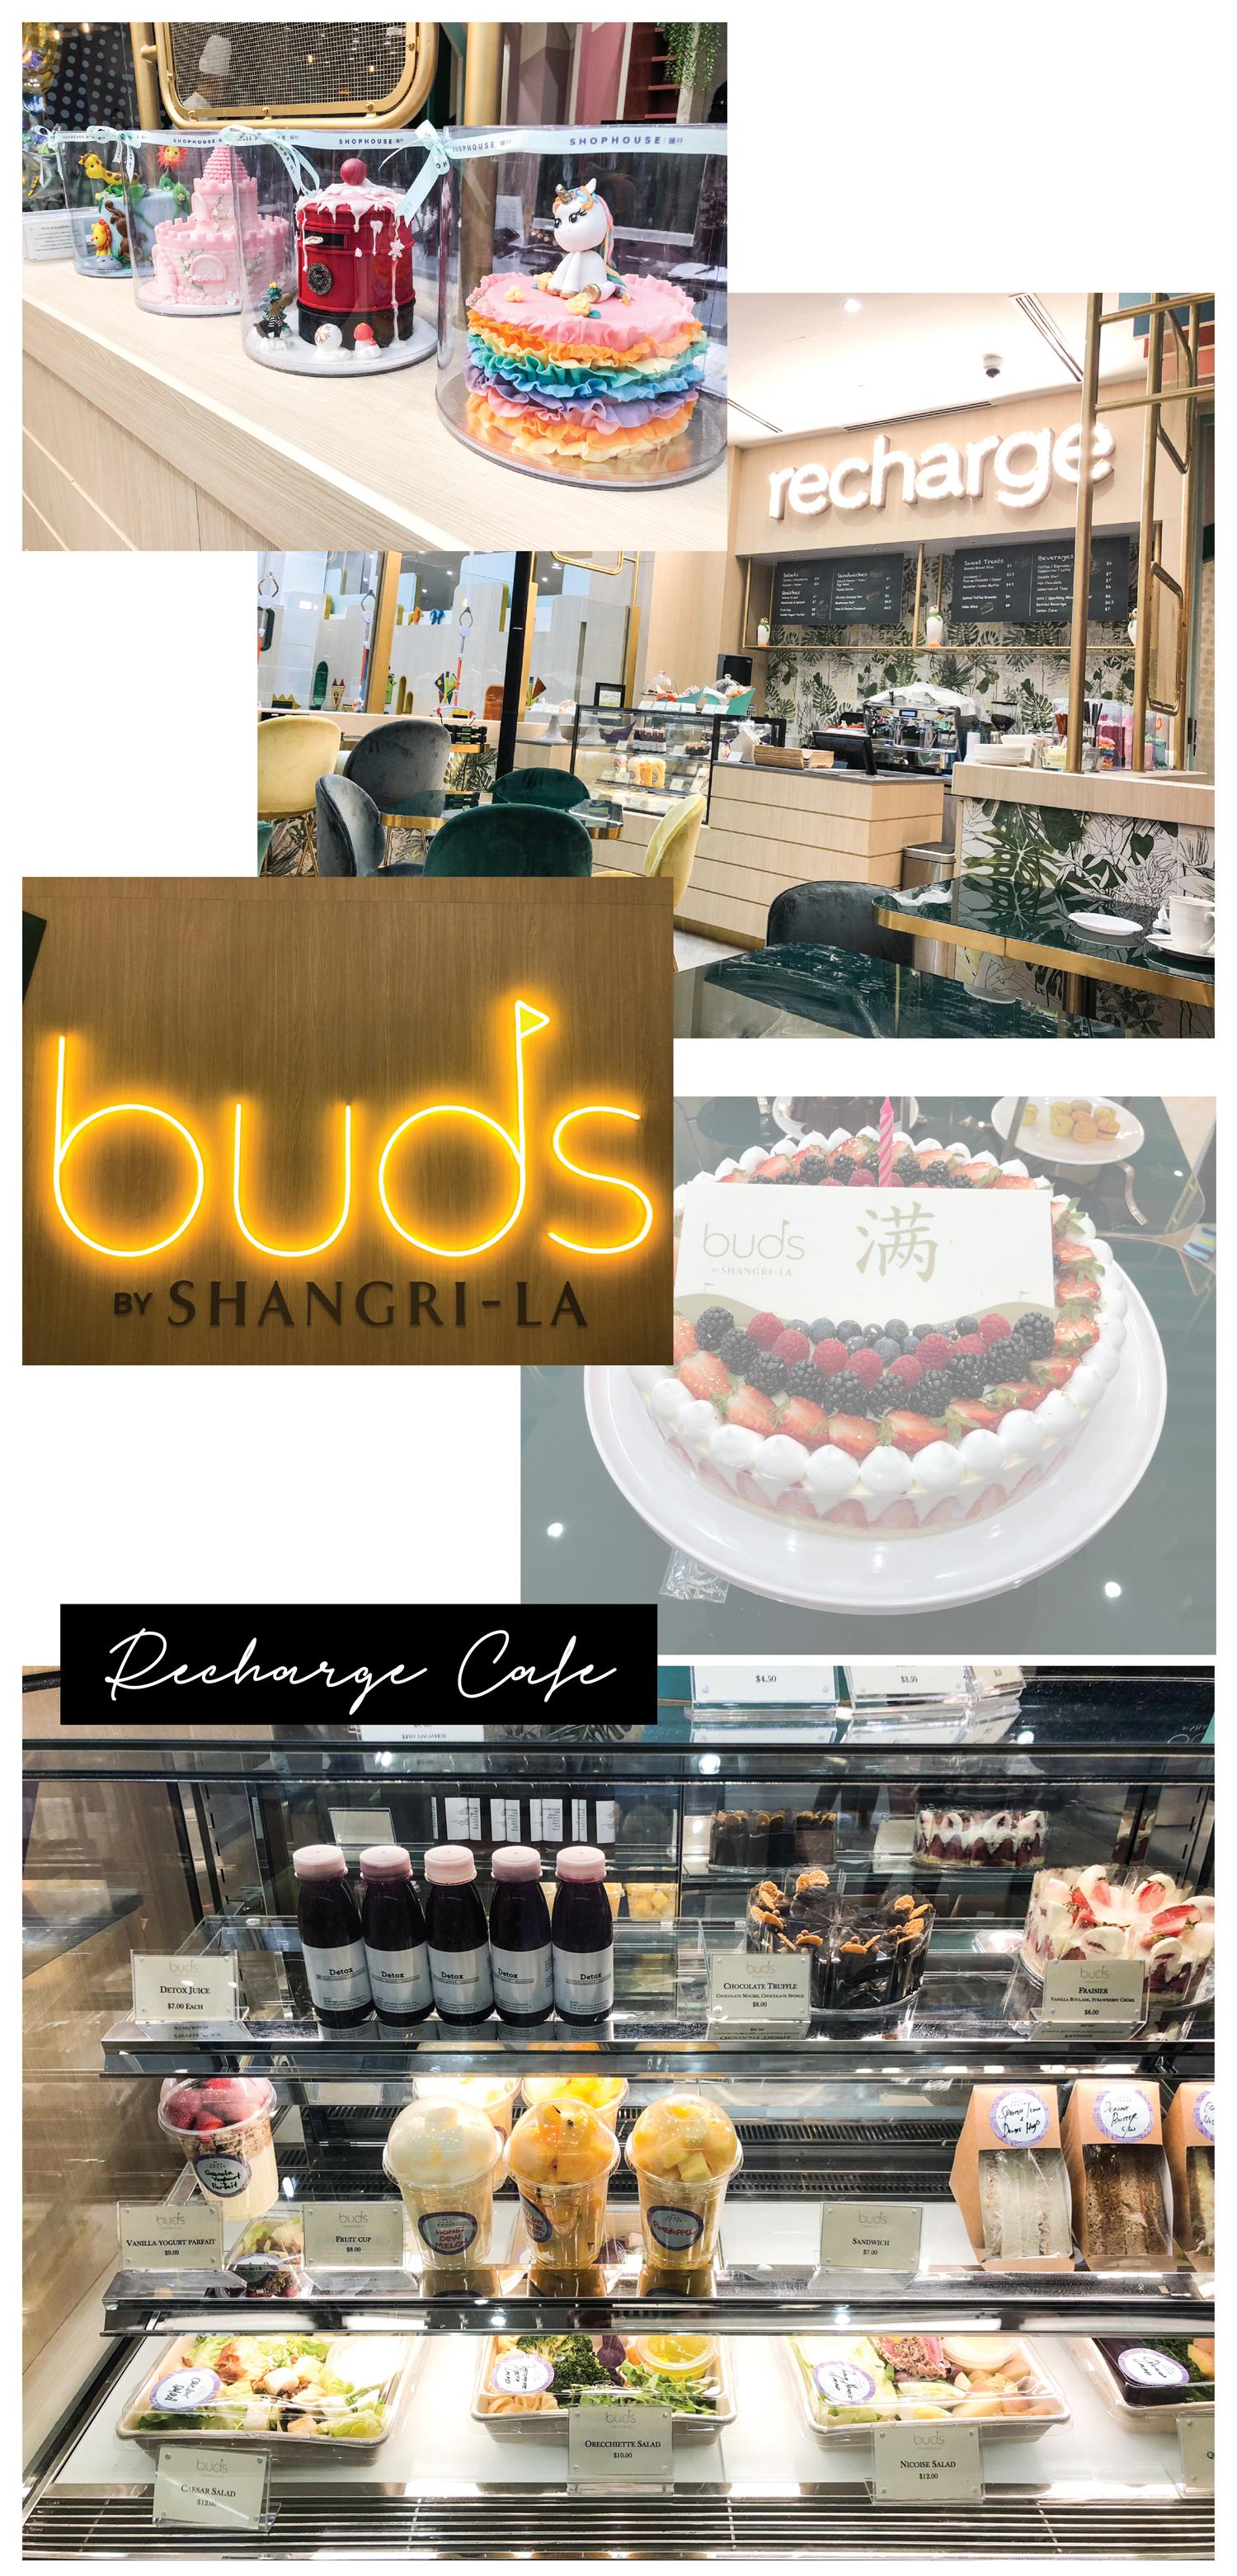 buds-by-shangri-la